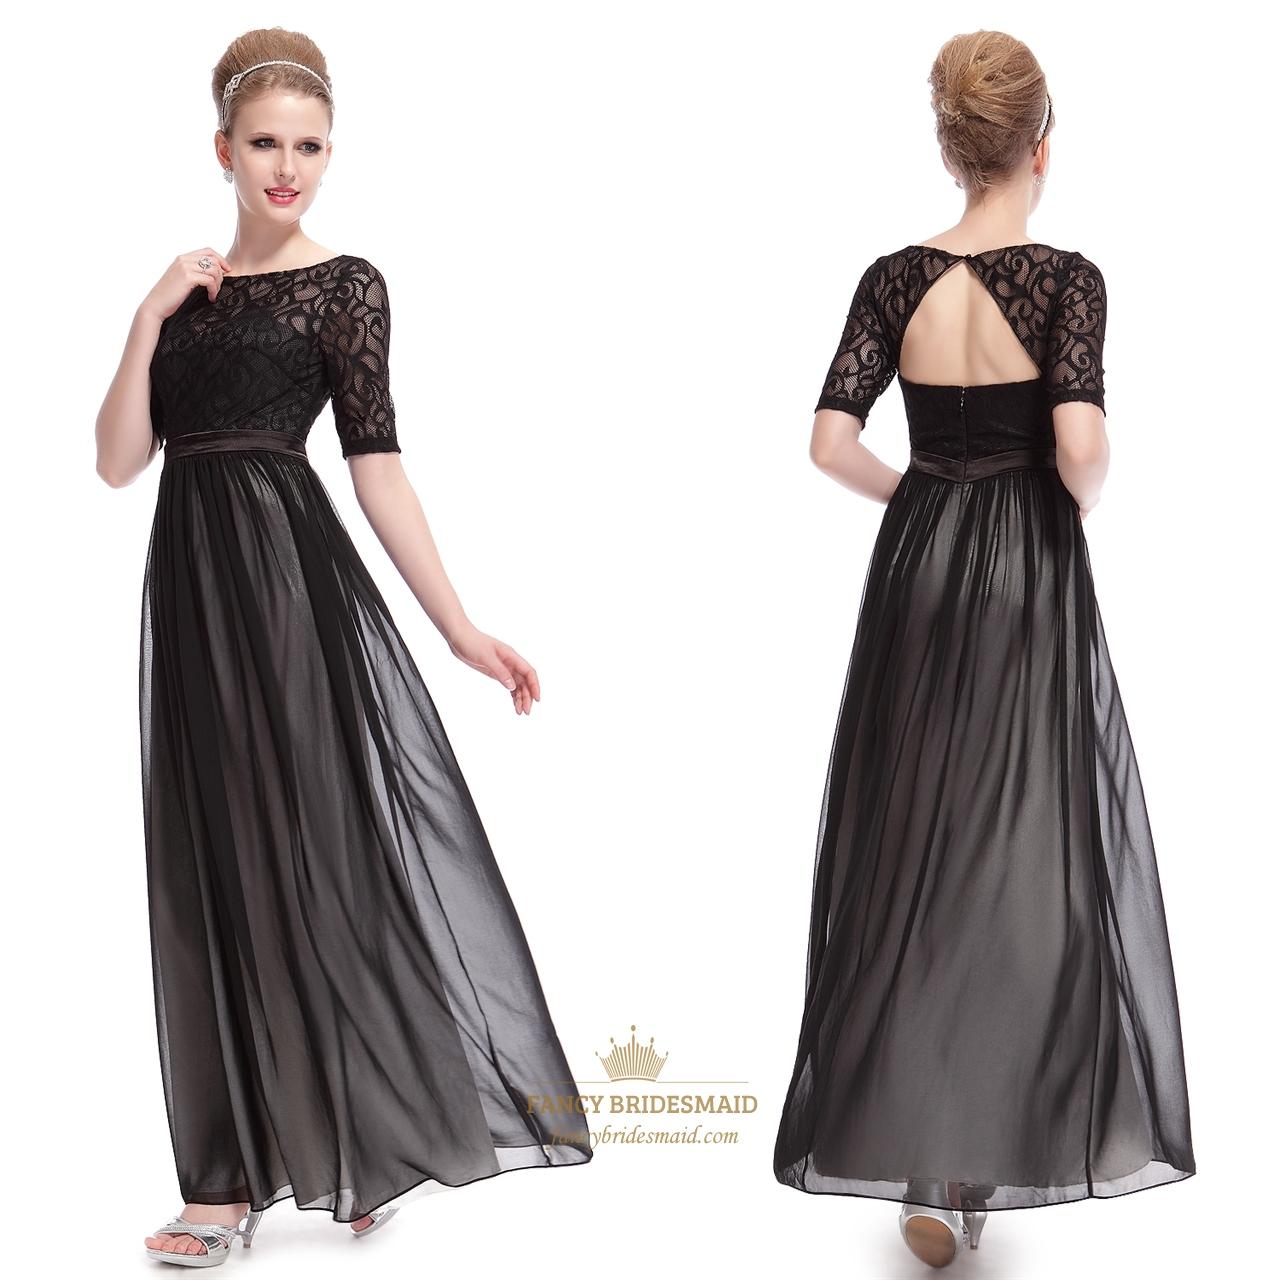 elegant black dresses with lace long sleeves overlaylong